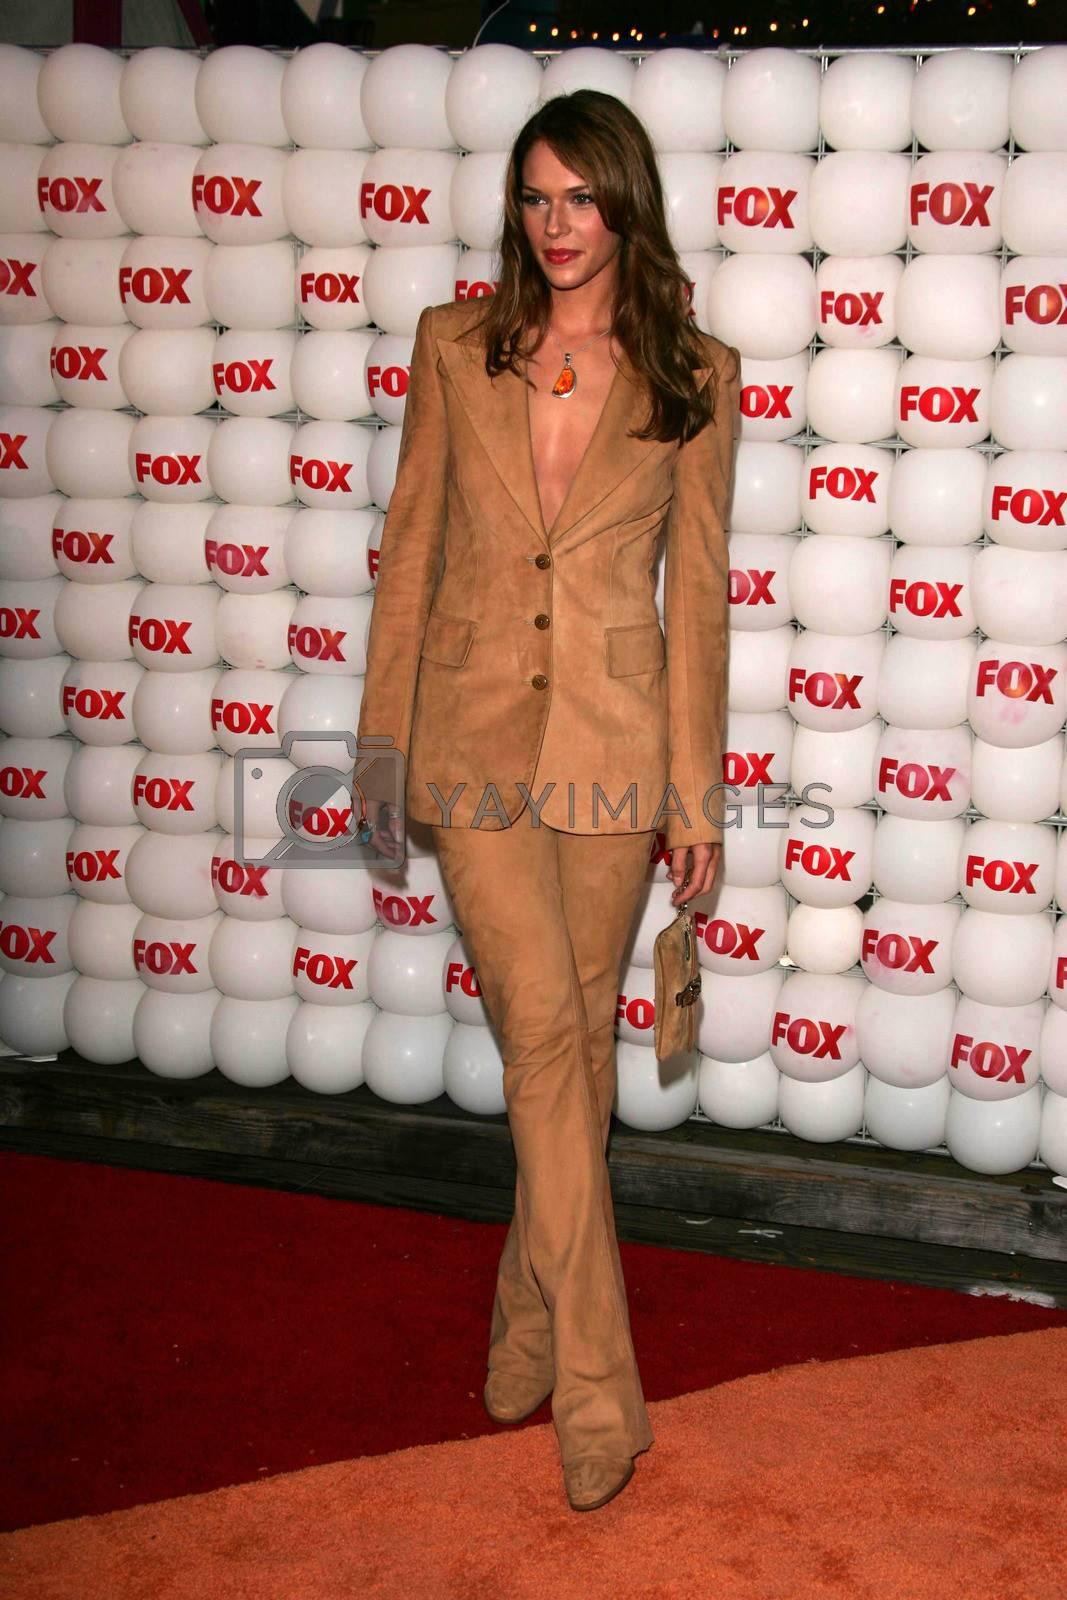 Amanda Righetti At the FOX Summer 2005 TCA Party, Santa Monica Pier, Santa Monica, CA 07-29-05